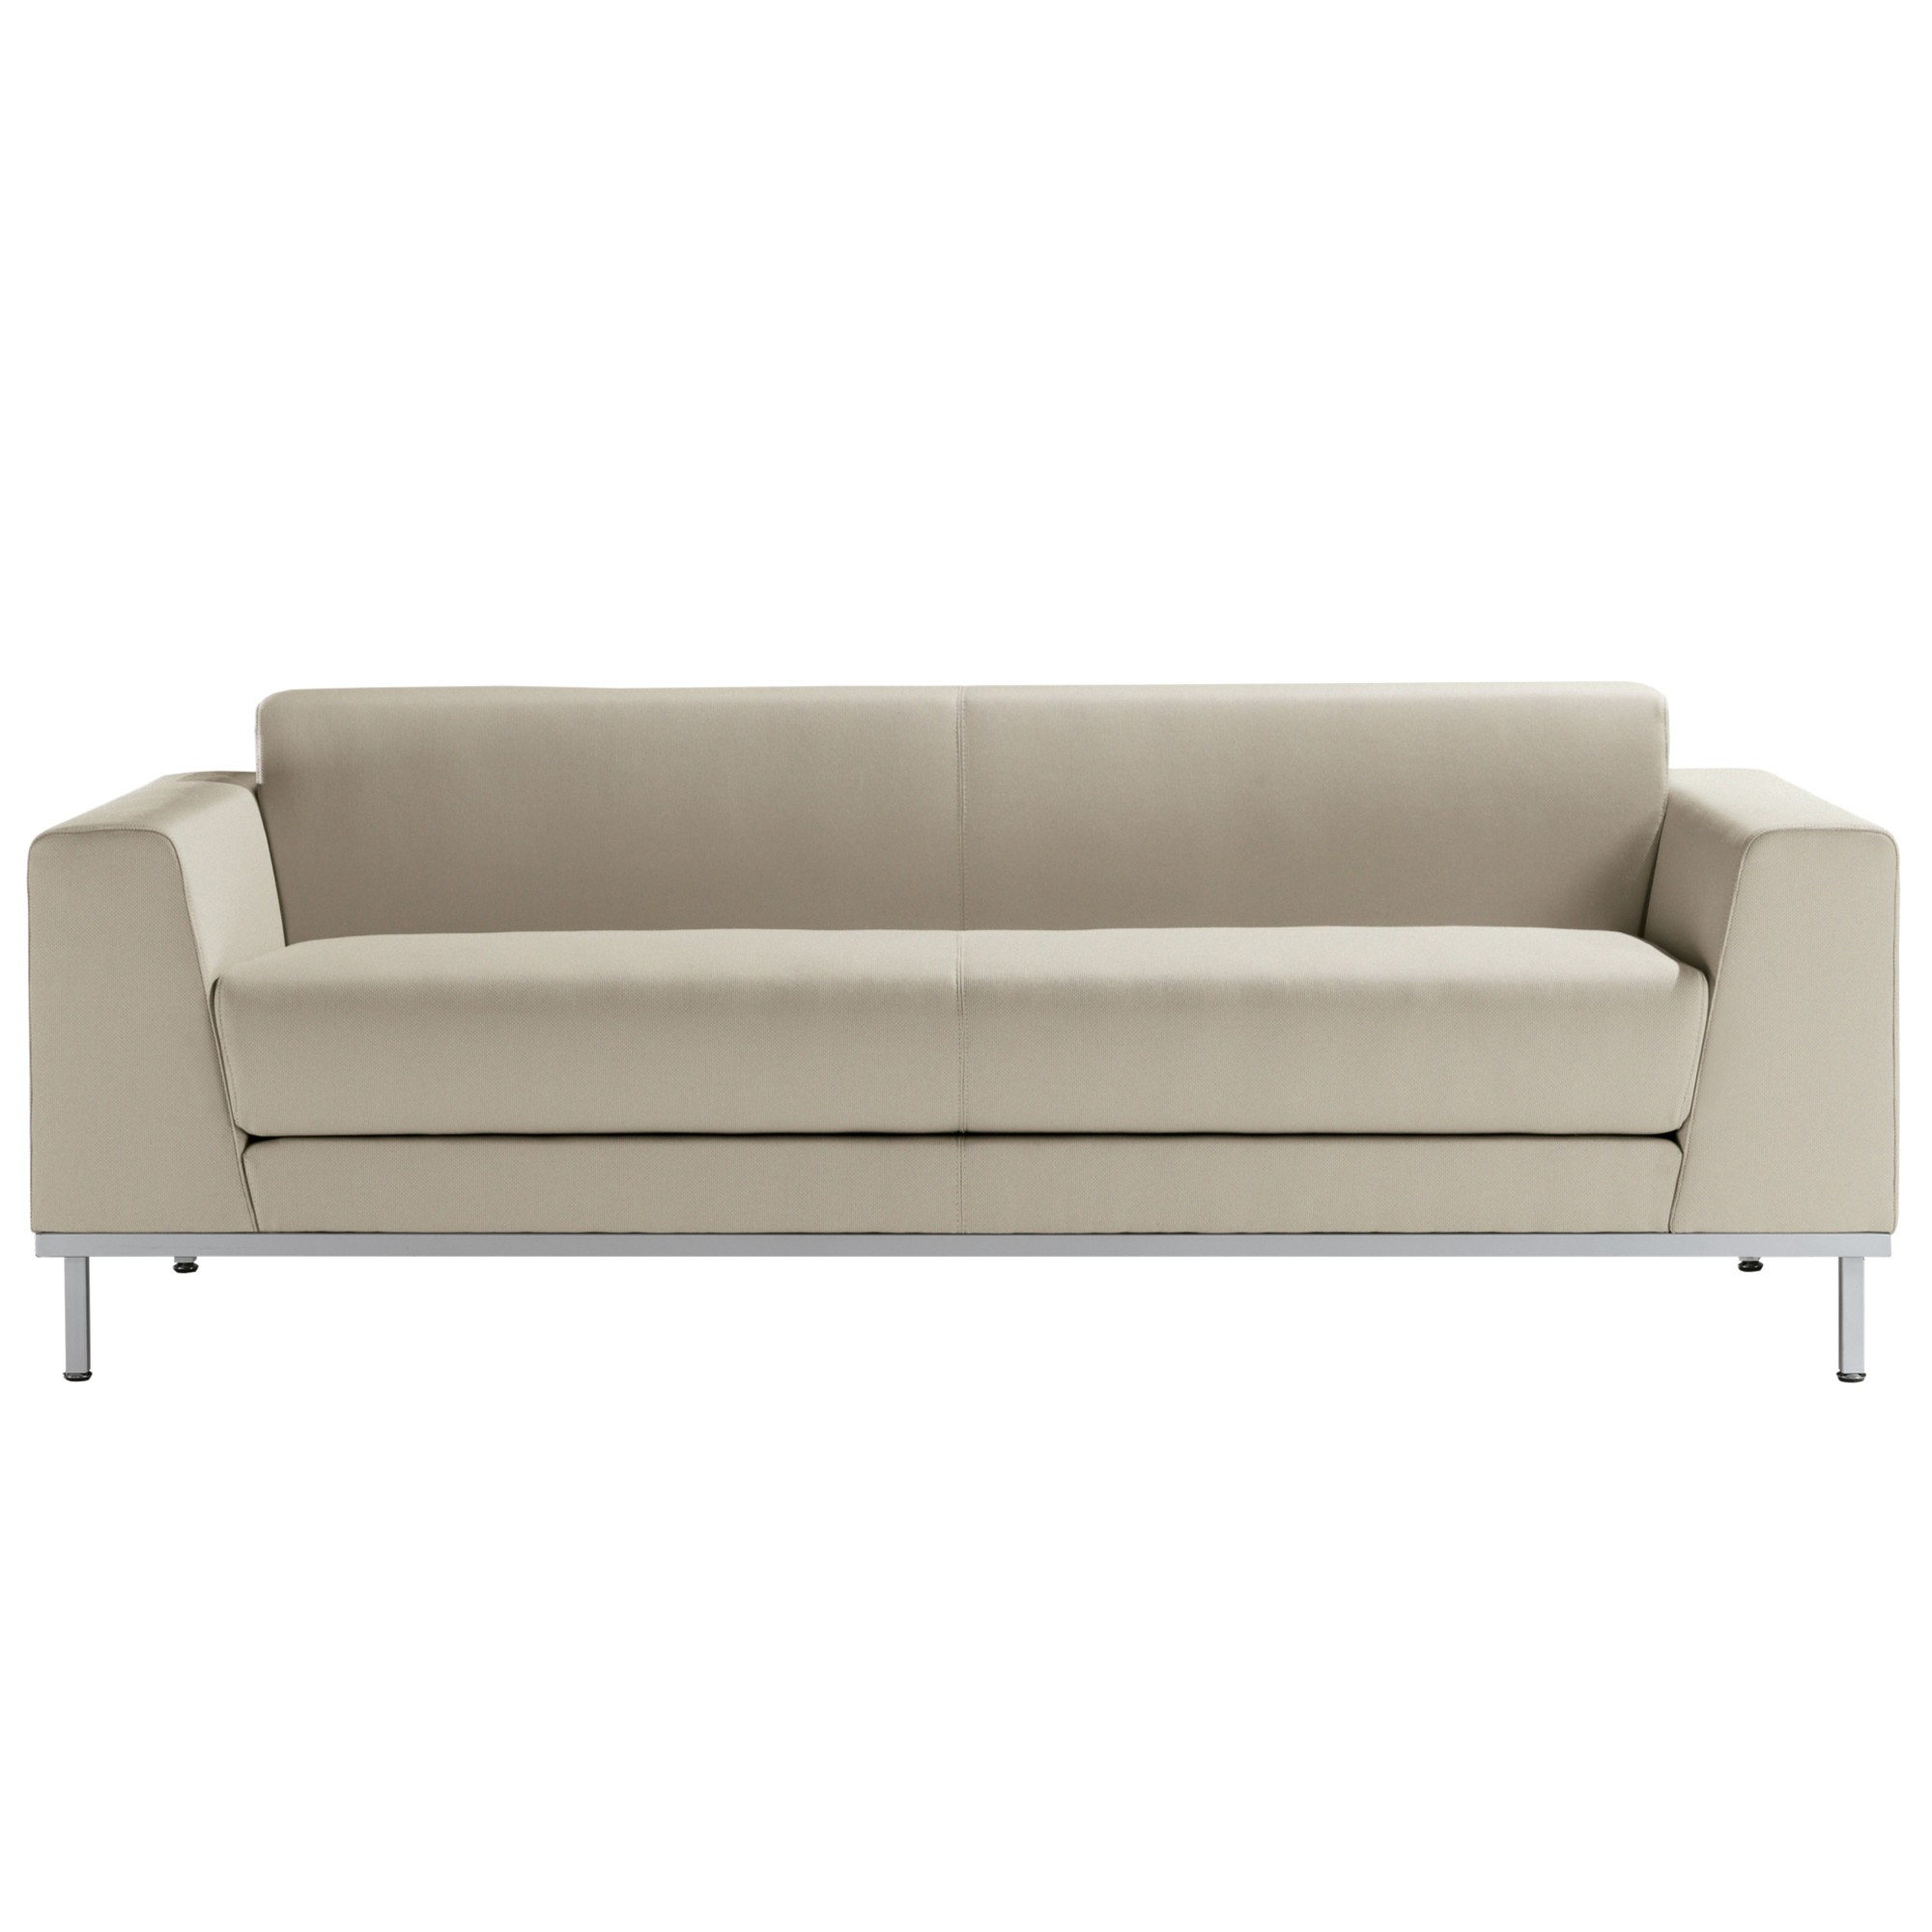 KOMODO SOFA Linear Sofas Armchairs and Sofas KASTEL